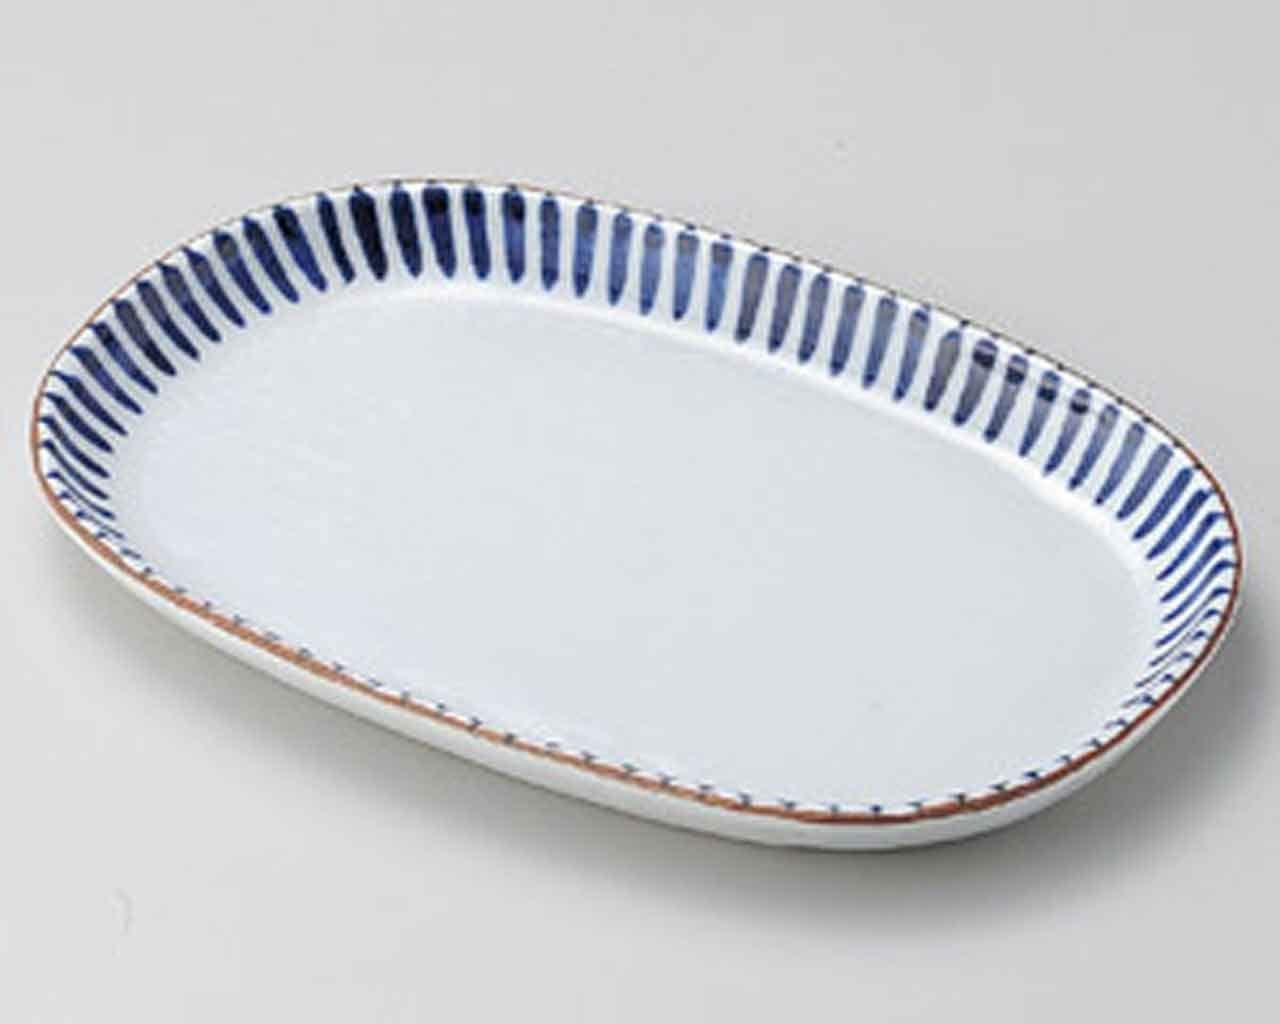 Blue Tokusa 10.6inch Medium Plate White porcelain Made in Japan